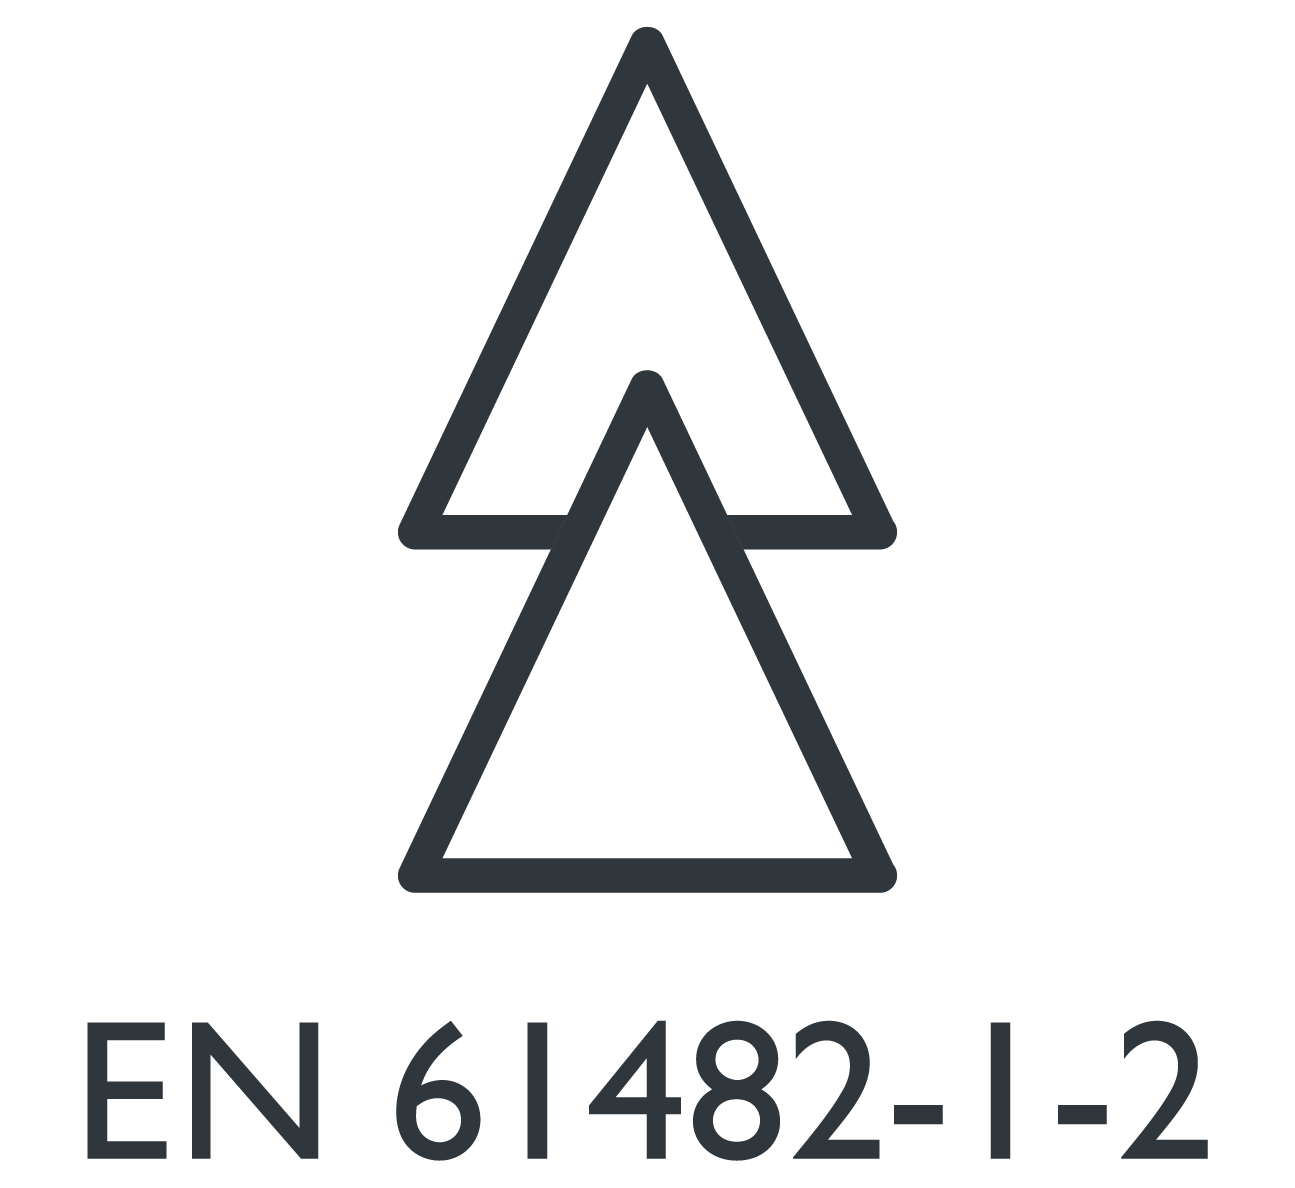 EN 61482-1-2 roupa de proteção para arco elétrico Marina Textil